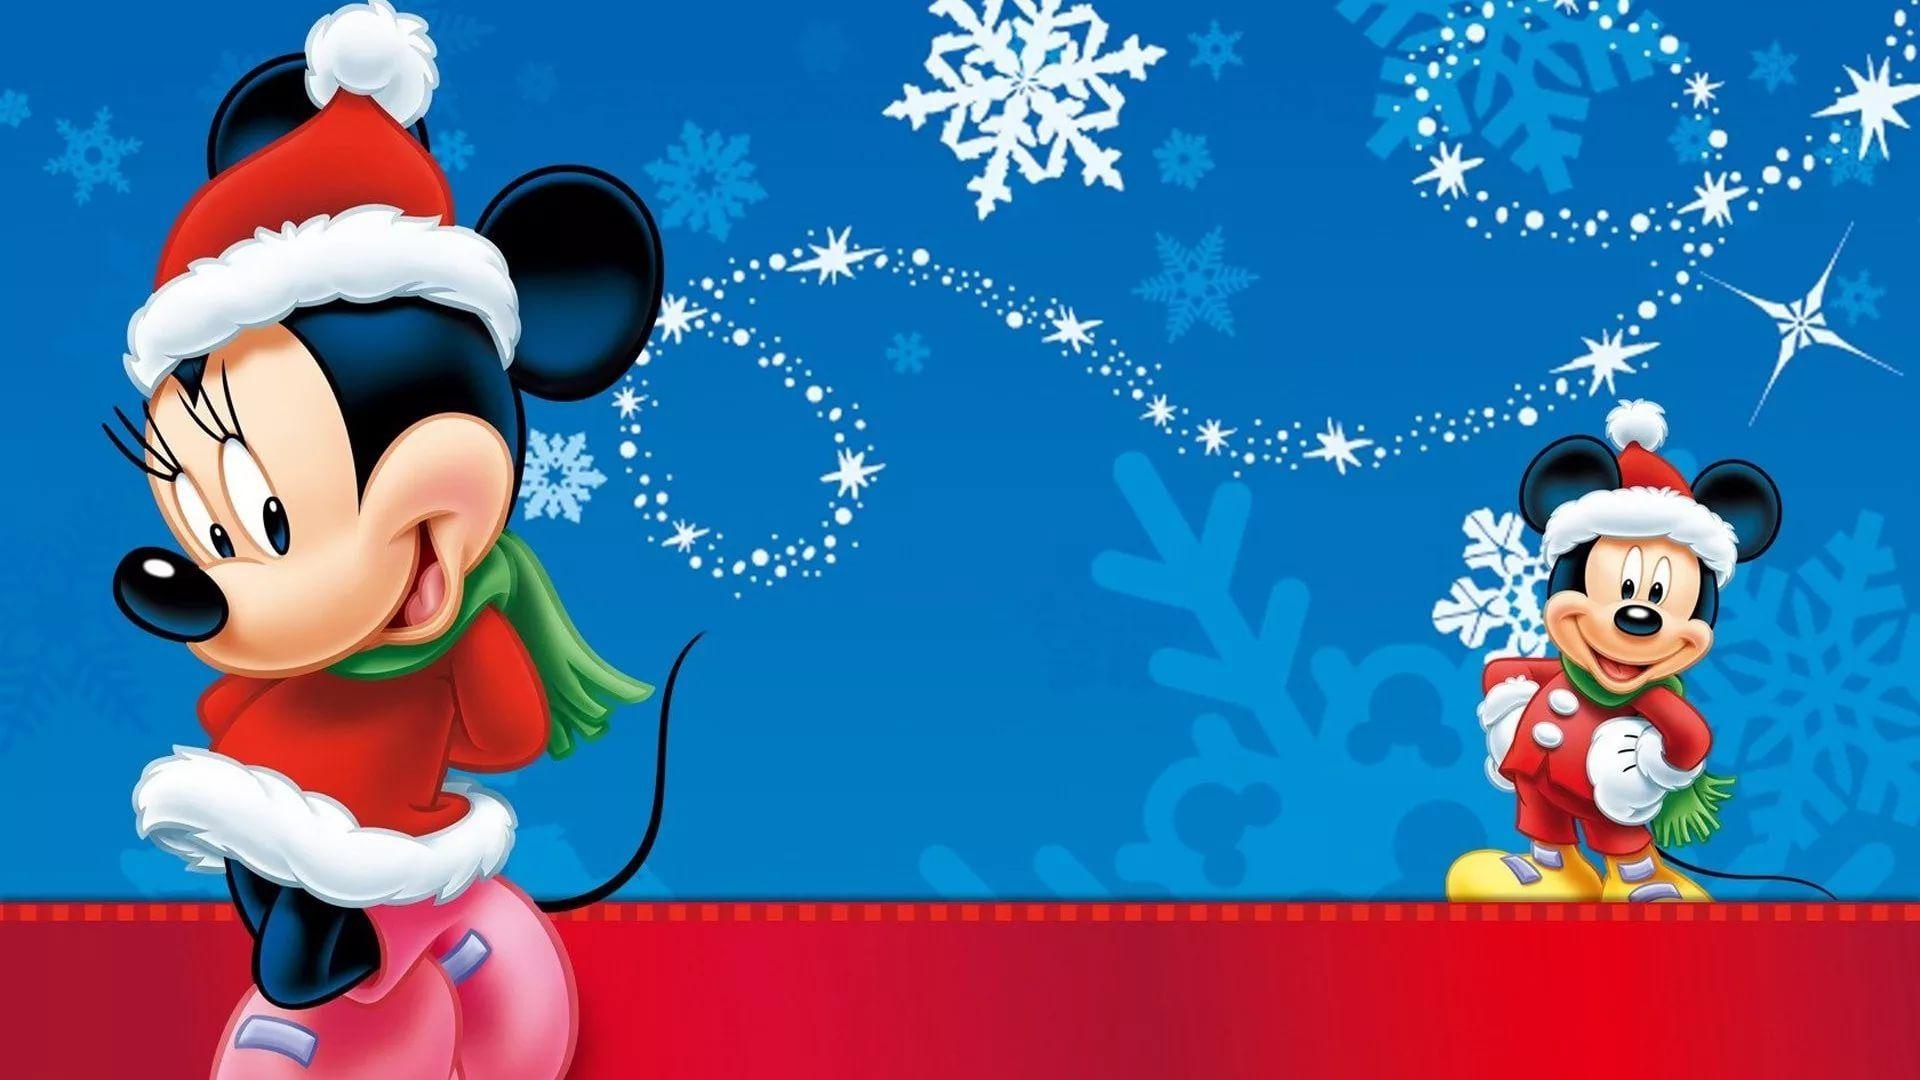 Disney Christmas wallpaper image hd